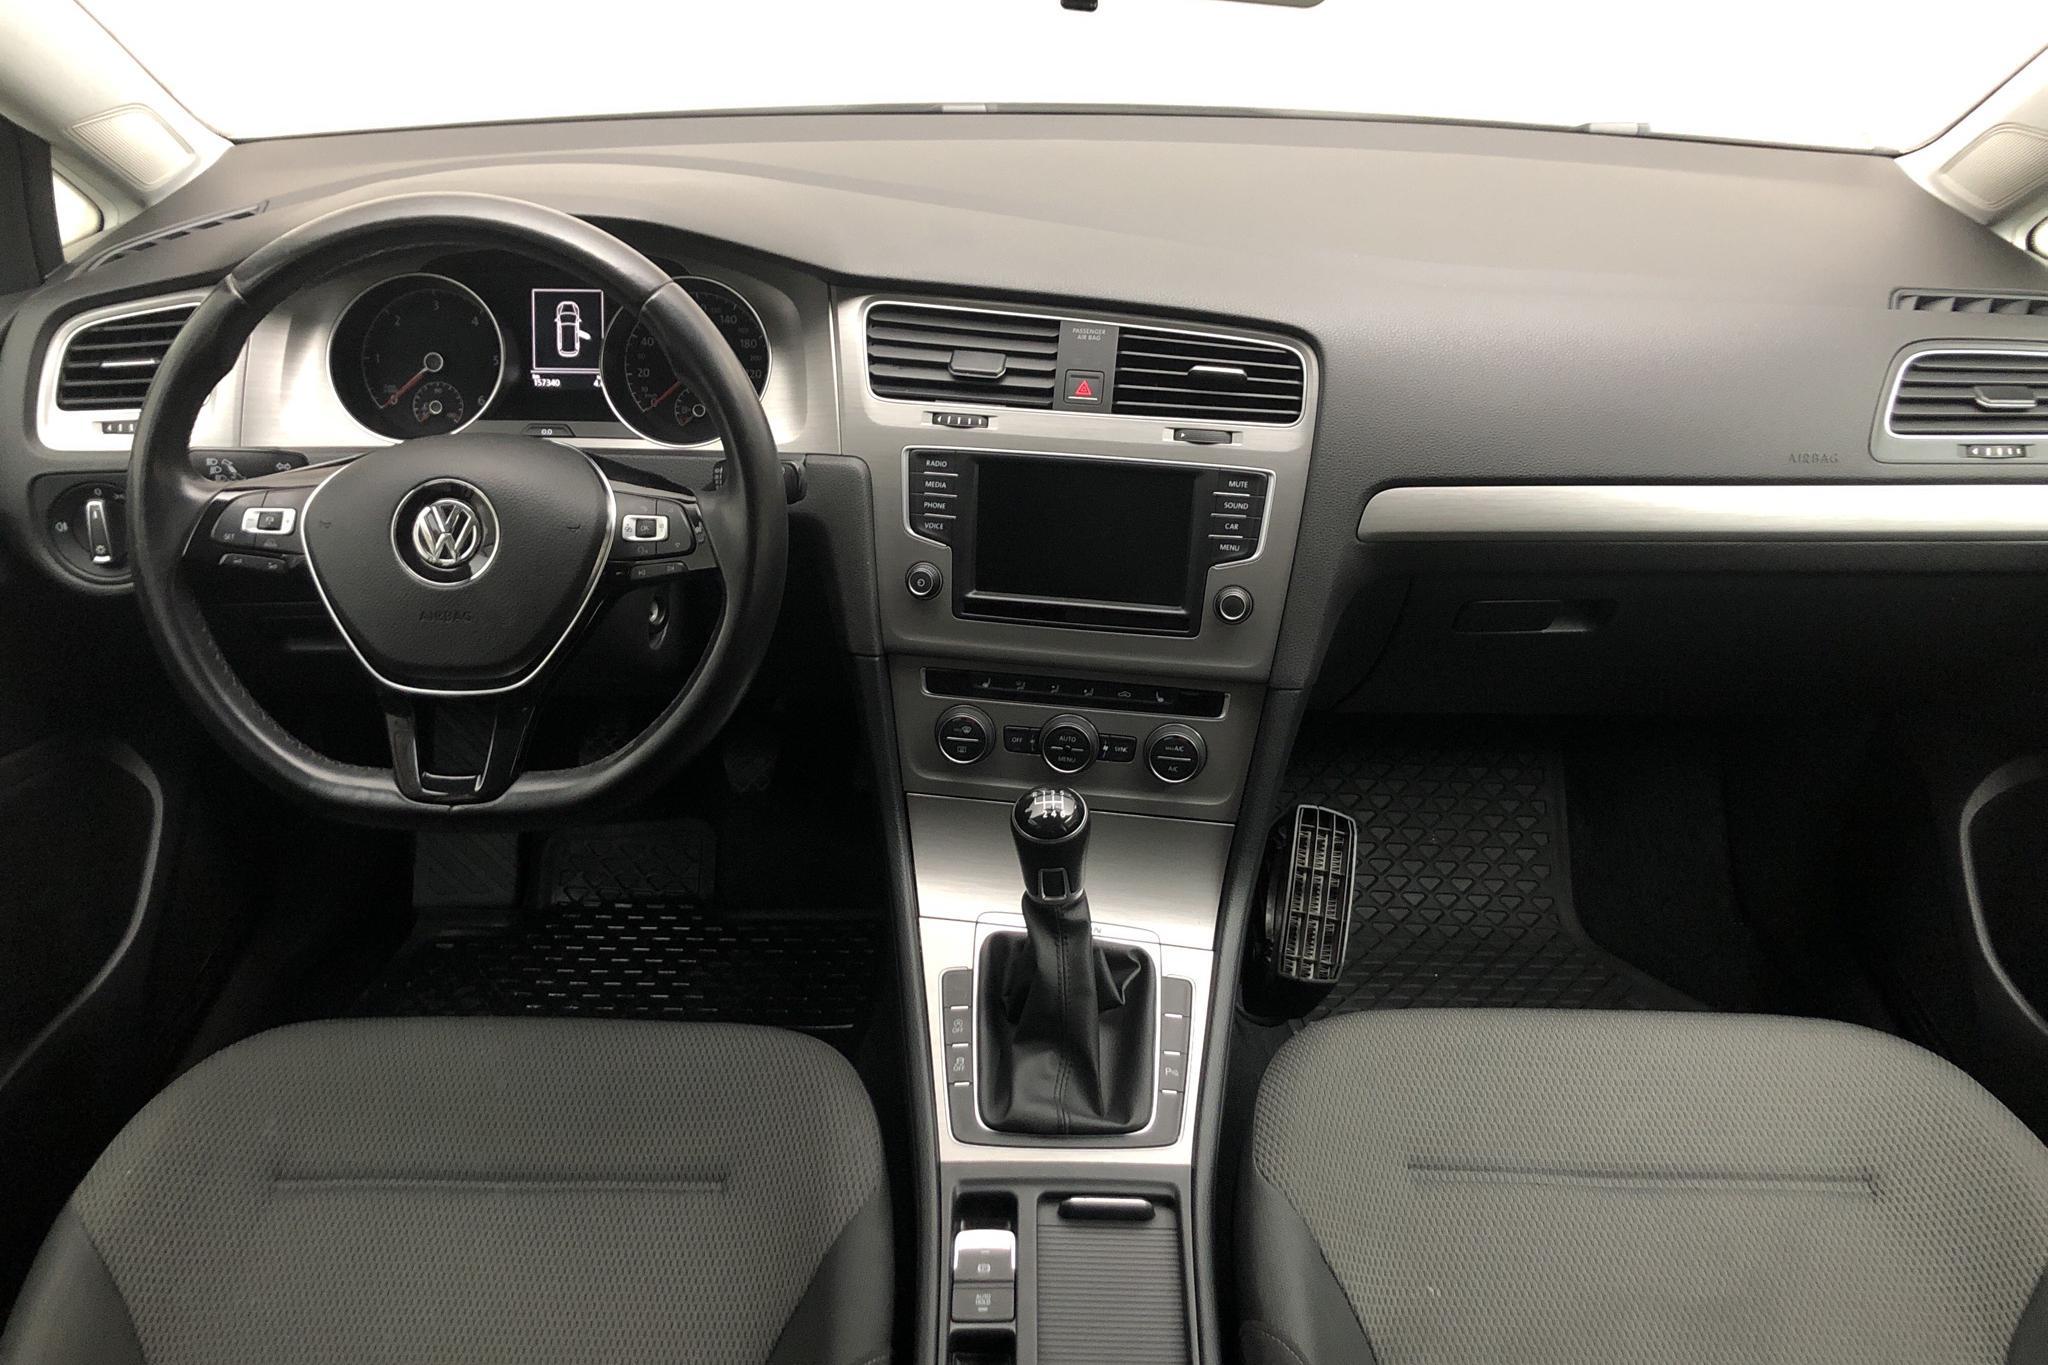 VW Golf VII 1.6 TDI BlueMotion Sportscombi 4Motion (110hk) - 15 733 mil - Manuell - vit - 2017